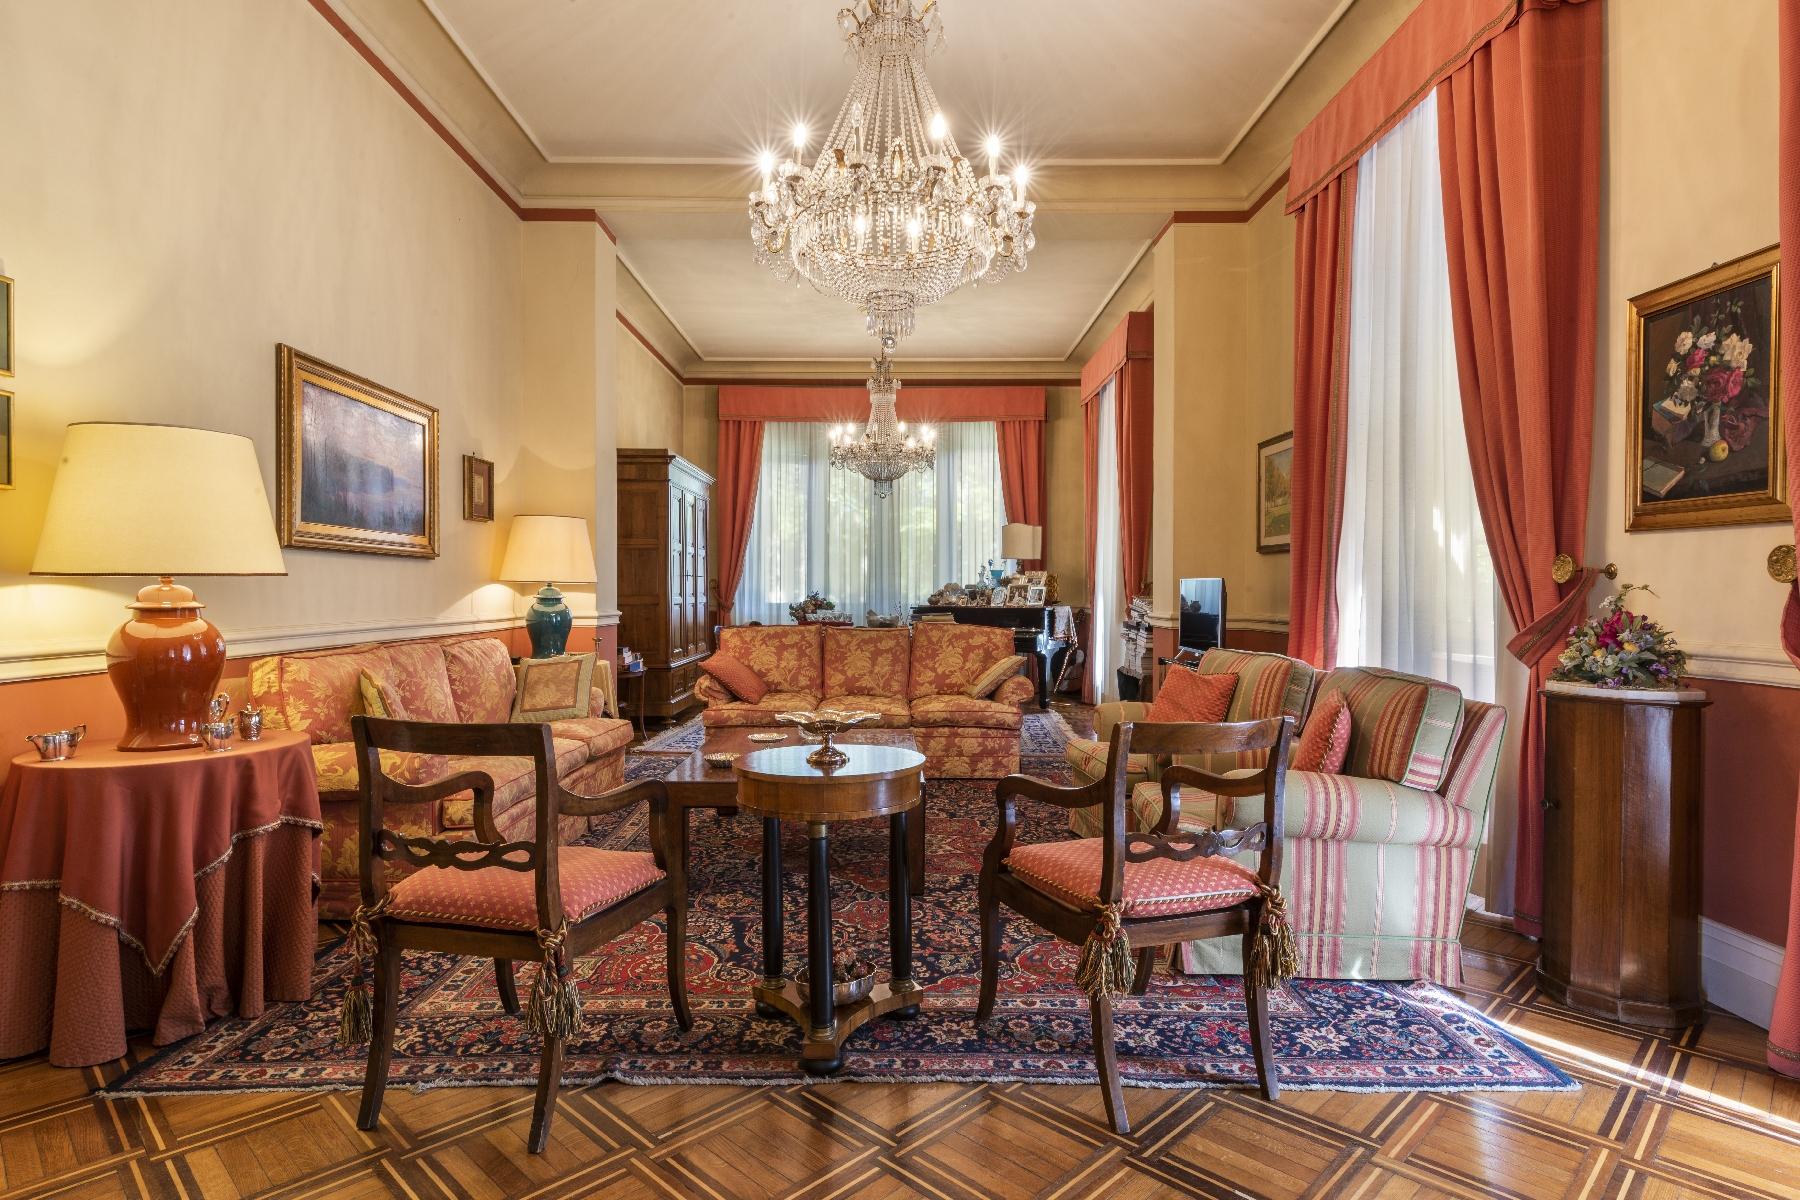 Villa in Vendita a Lucca: 5 locali, 660 mq - Foto 7